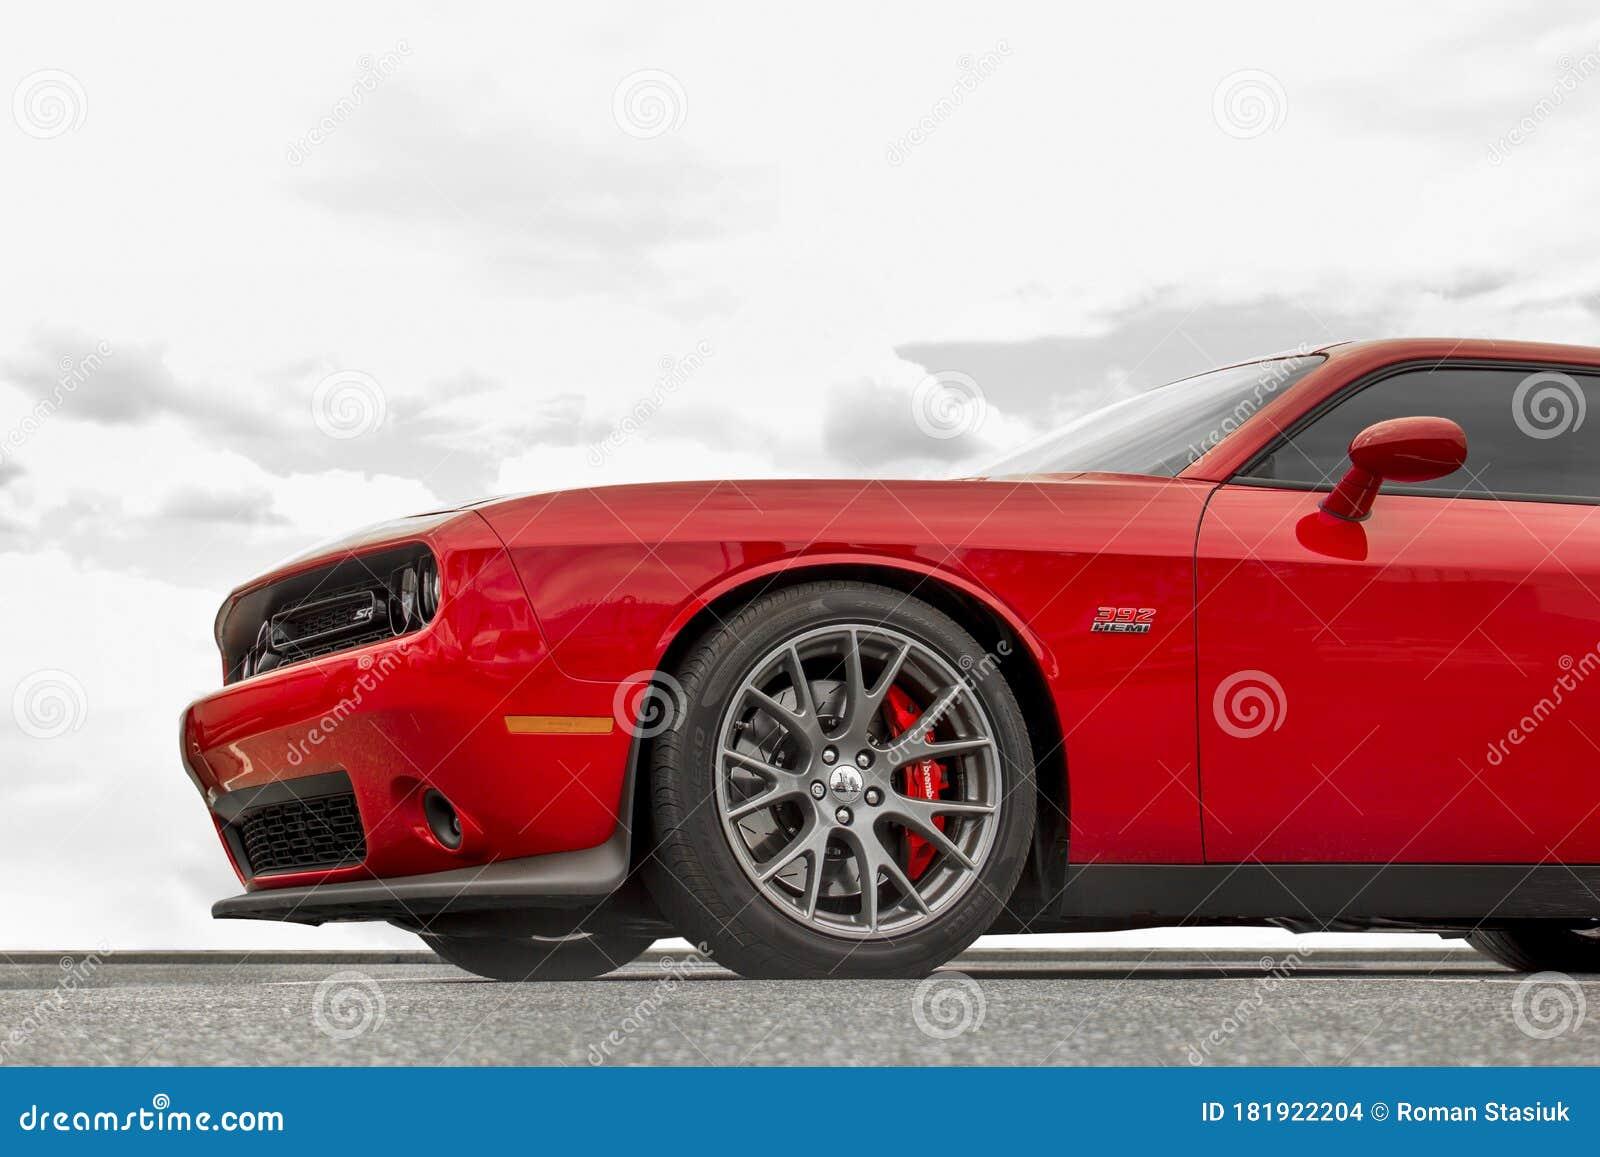 Kiev Ukraine April 21 2020 Muscle Car Dodge Challenger Srt8 392 Hemi Against The Sky Red Car On Sky Background Editorial Stock Image Image Of Motor Automobile 181922204